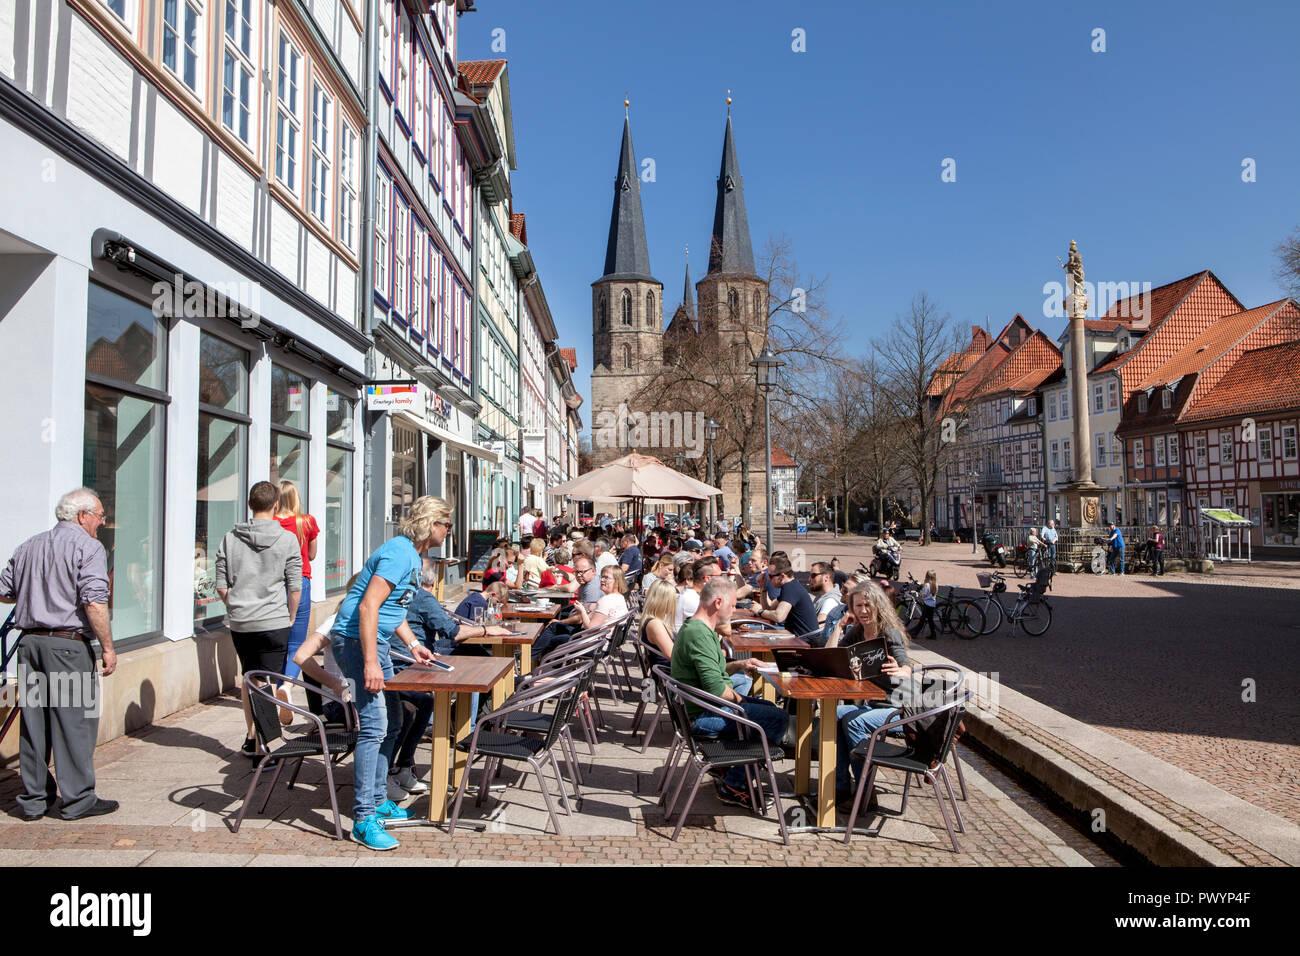 Market street, Duderstadt, Lower Saxony, Germany, Europe - Stock Image